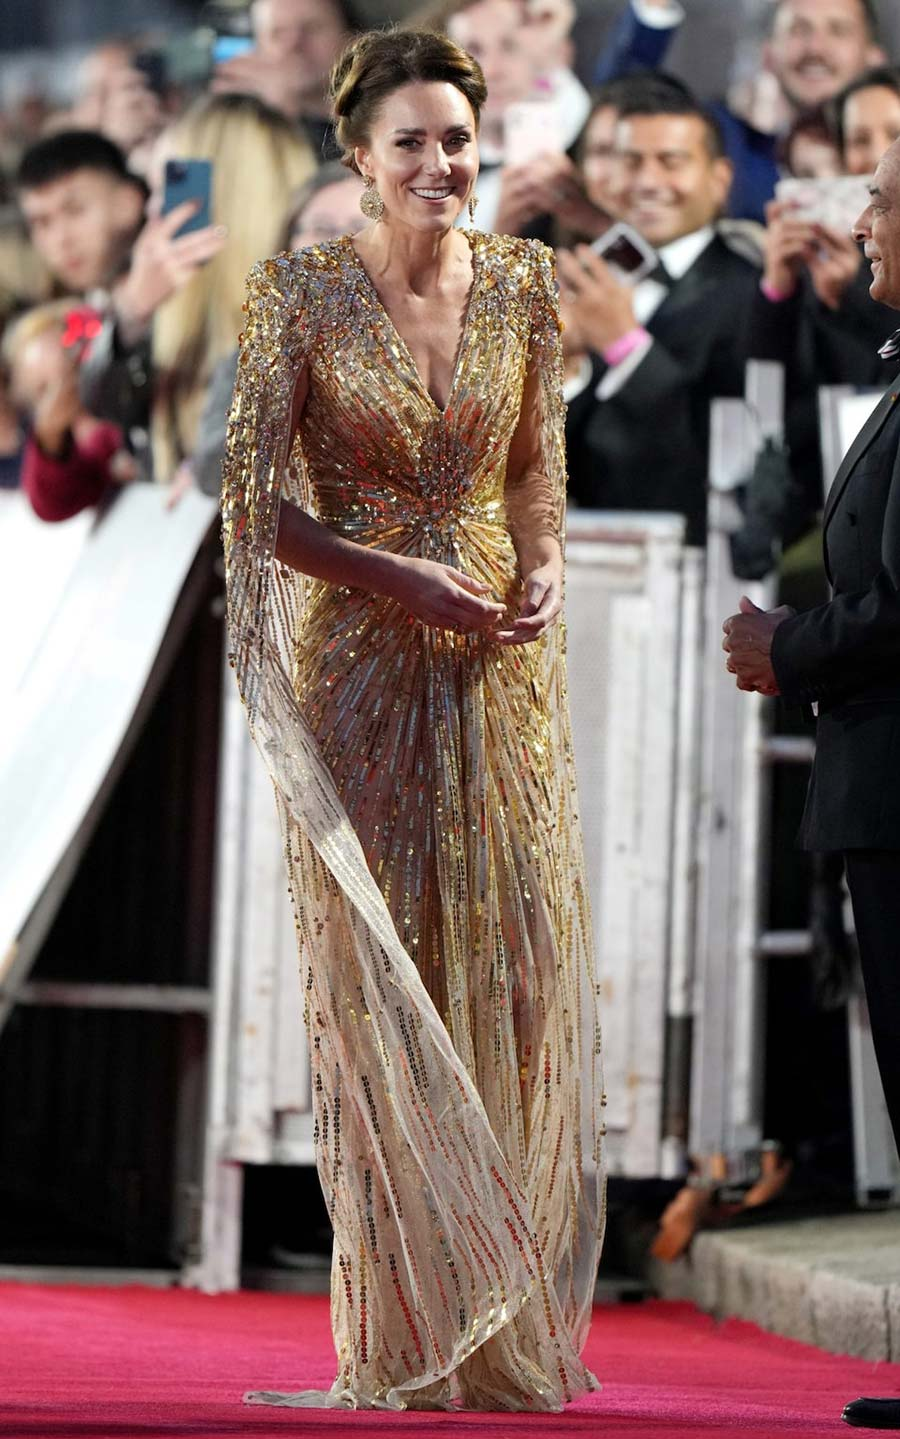 Kate Middleton Gold dress James Bond No Time To Die red carpet 2021